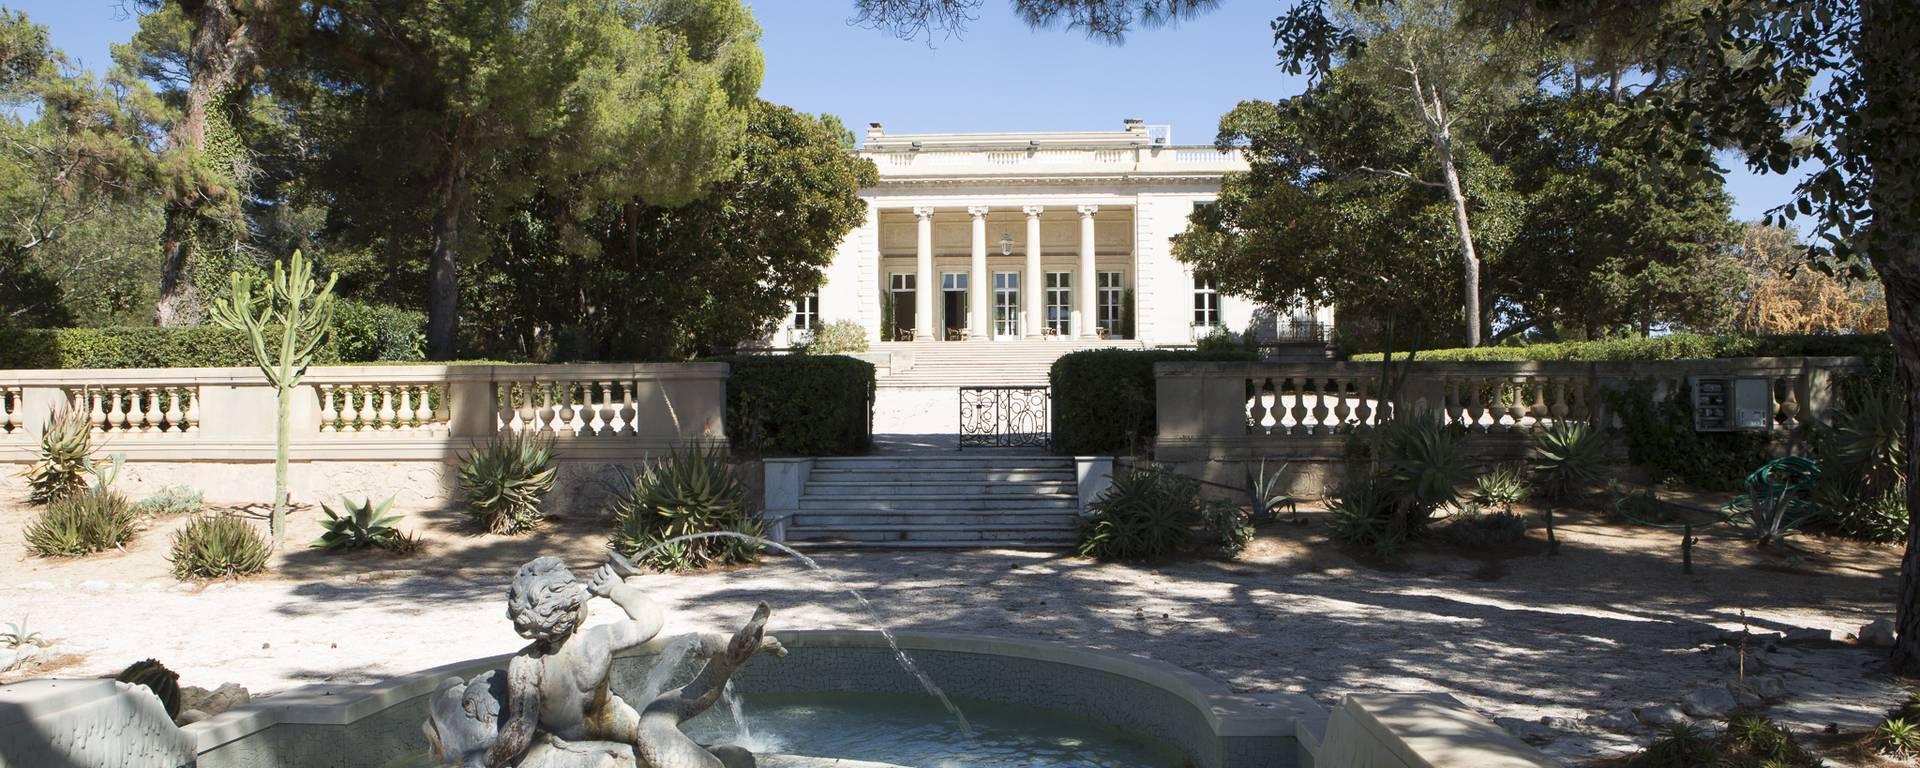 La Villa Eilenroc ©Mairie d'Antibes - J. Bayle